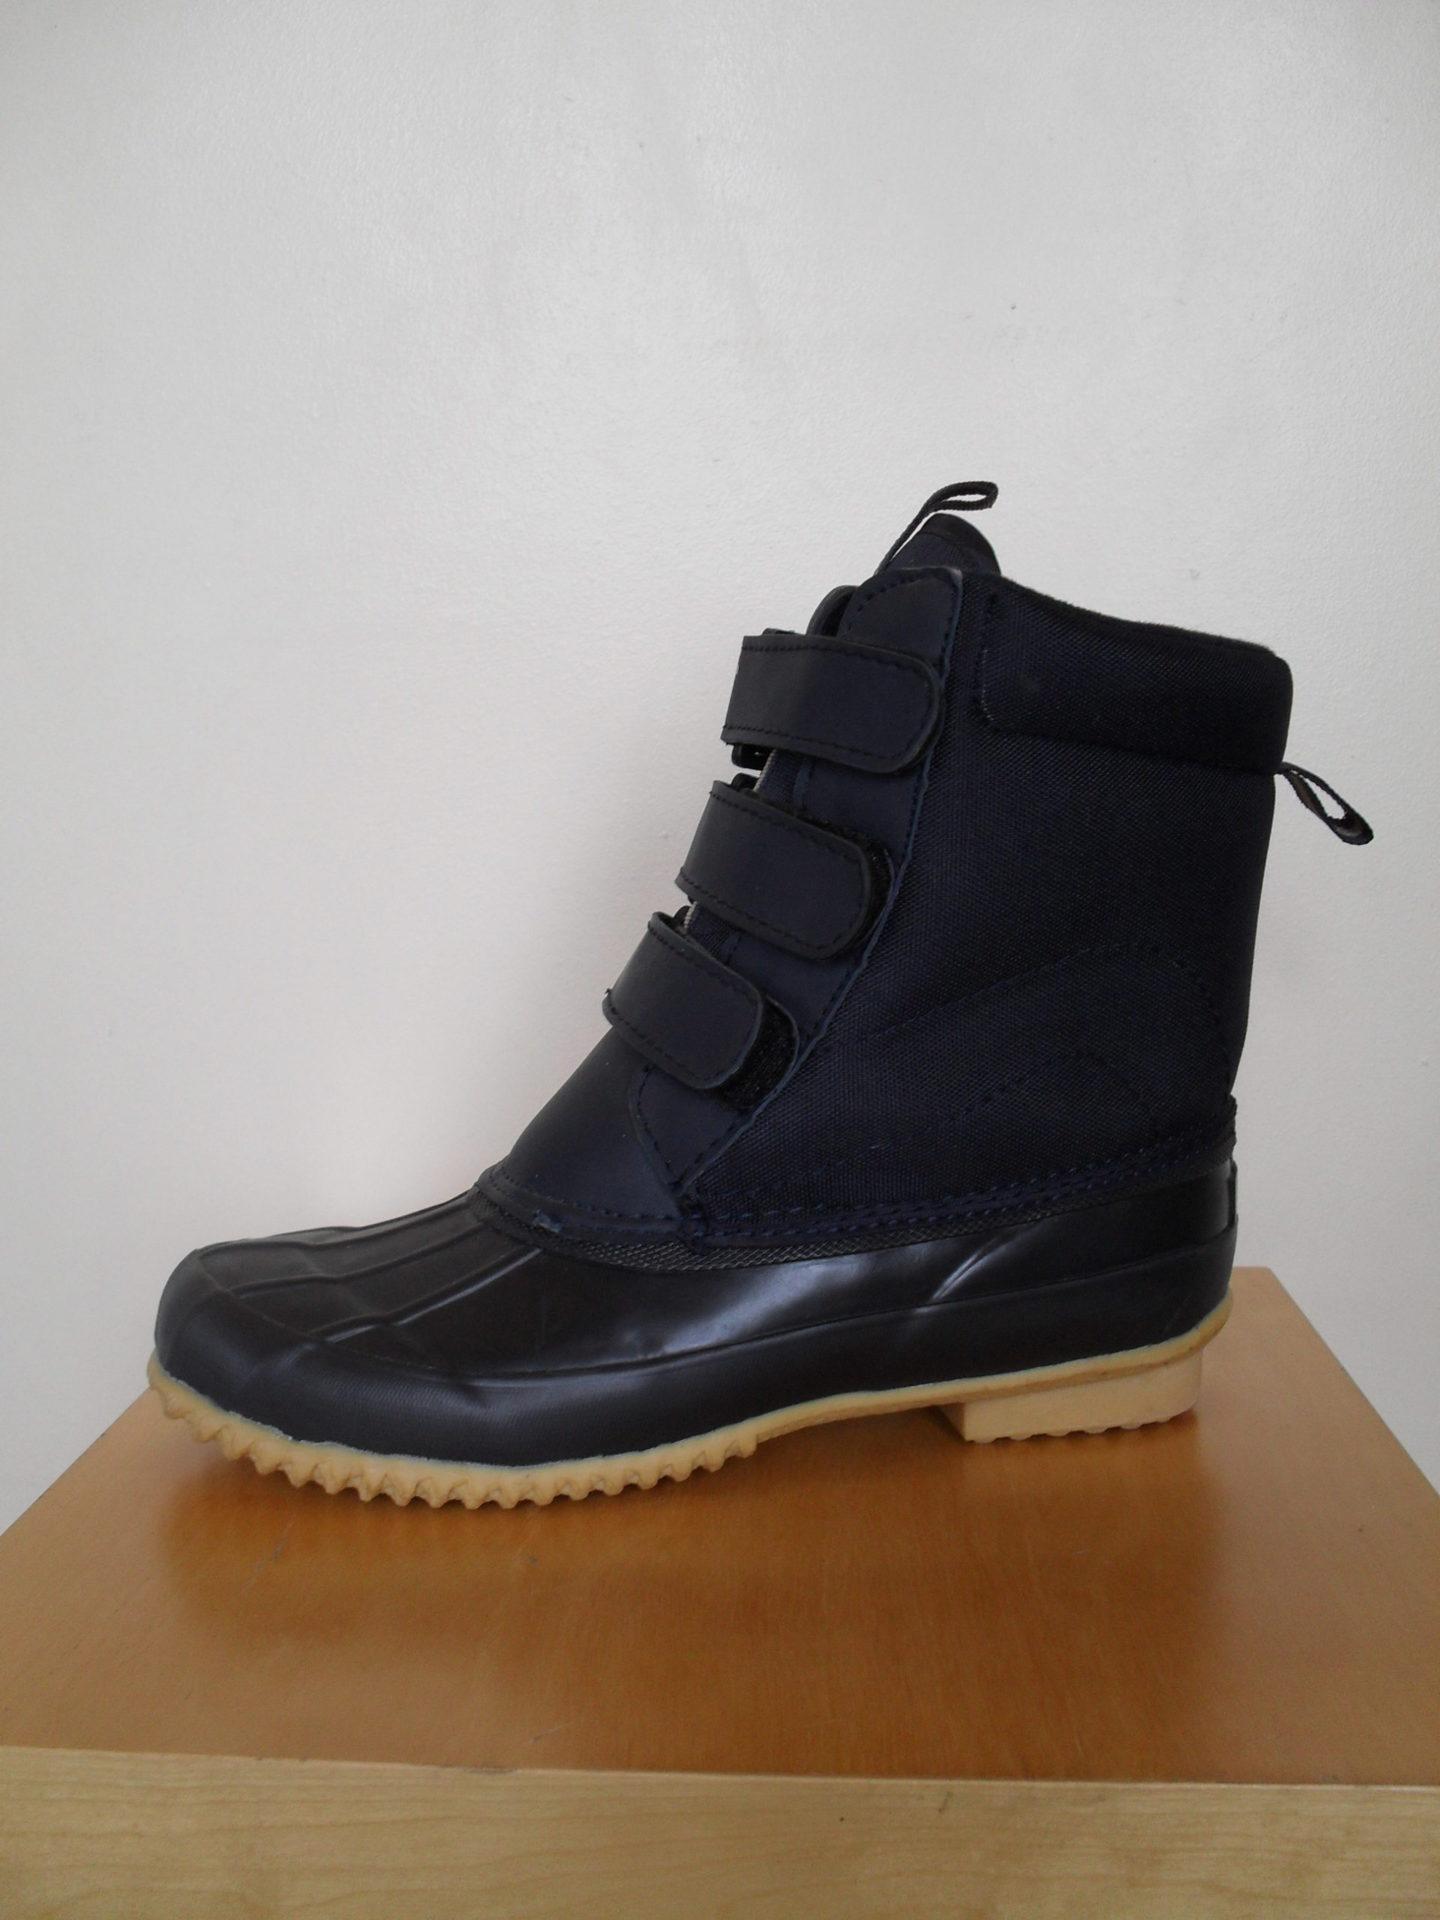 Splasher Mucker Boot